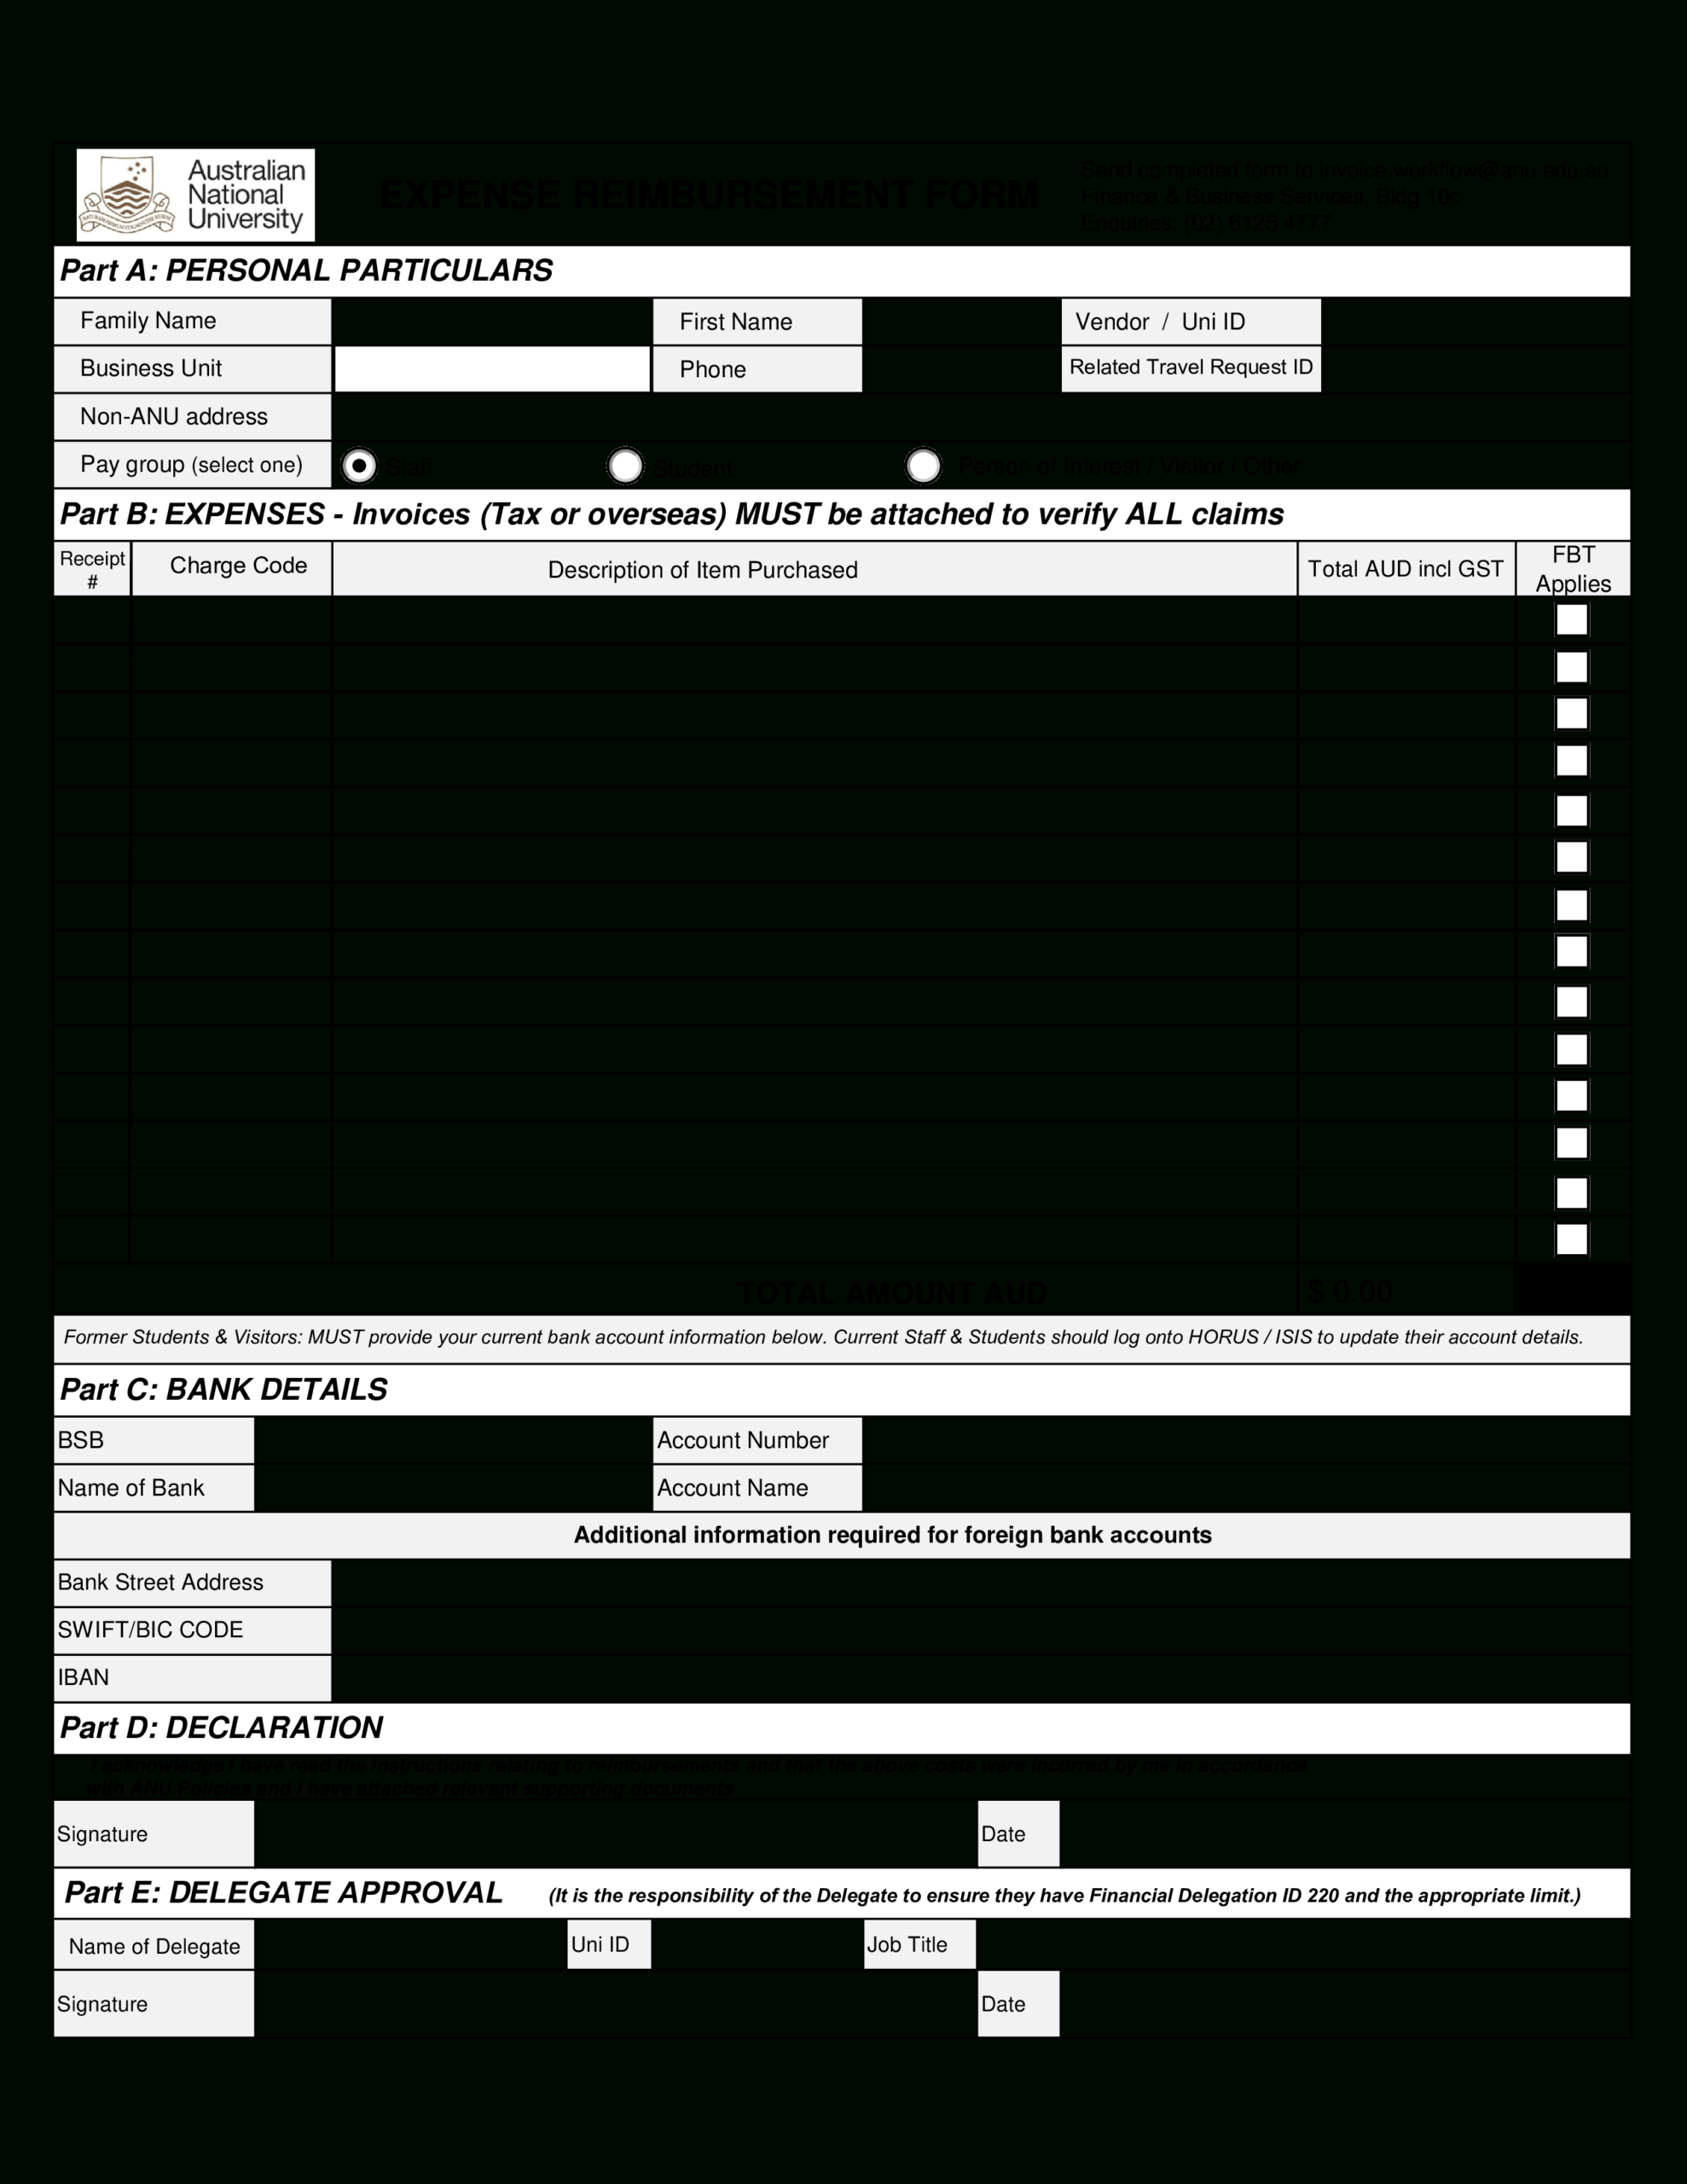 Expense Reimbursement Form | Templates At In Reimbursement Form Template Word